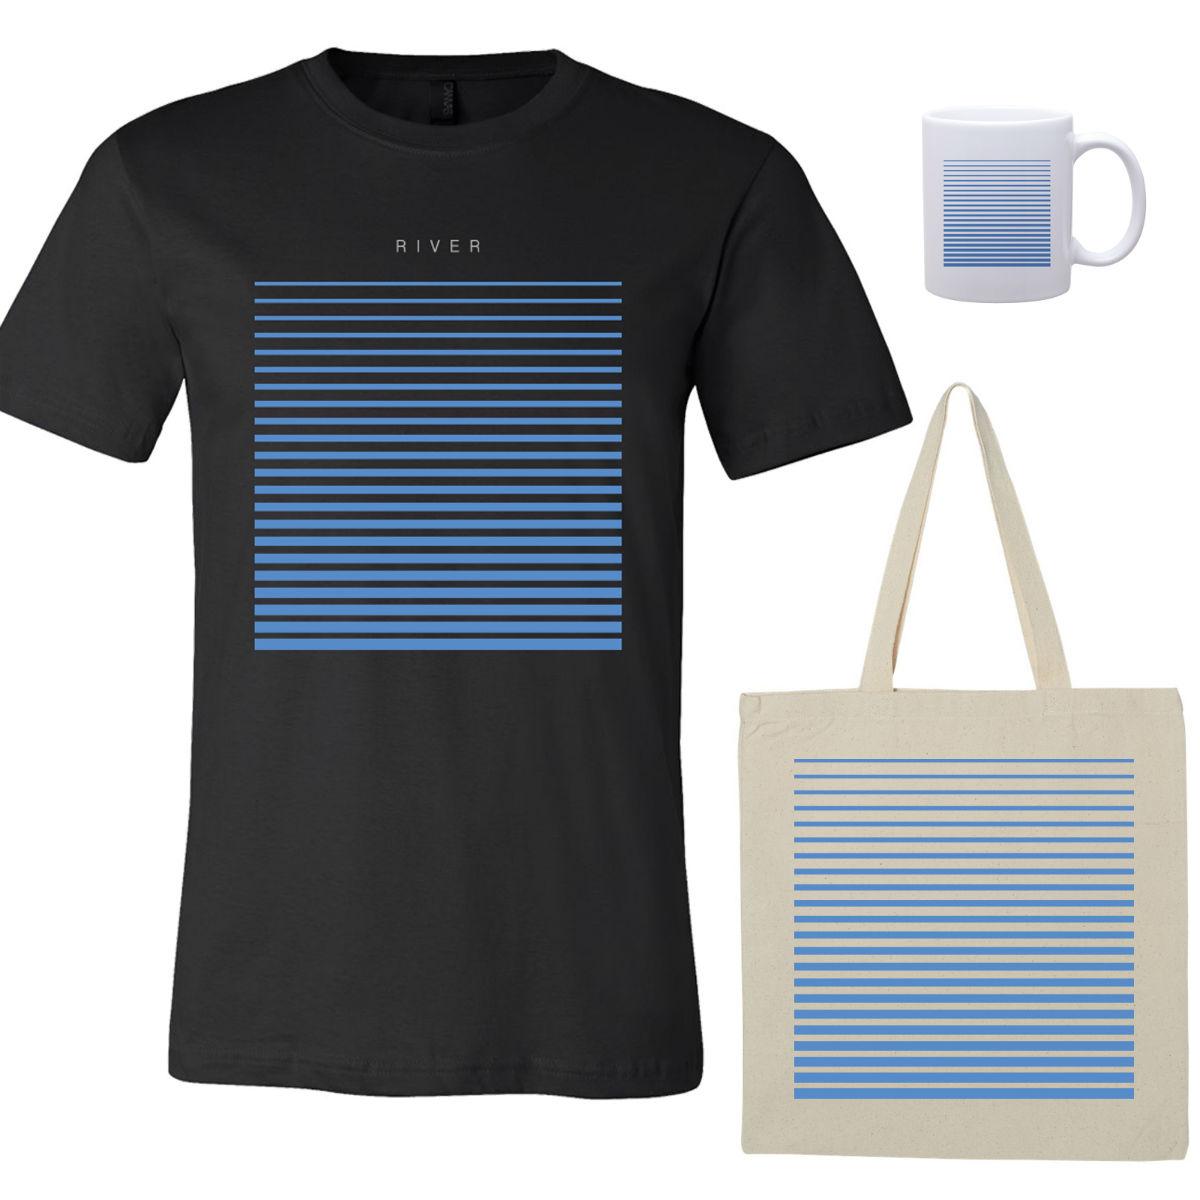 River T-Shirt - Black, Tote, Mug Bundle